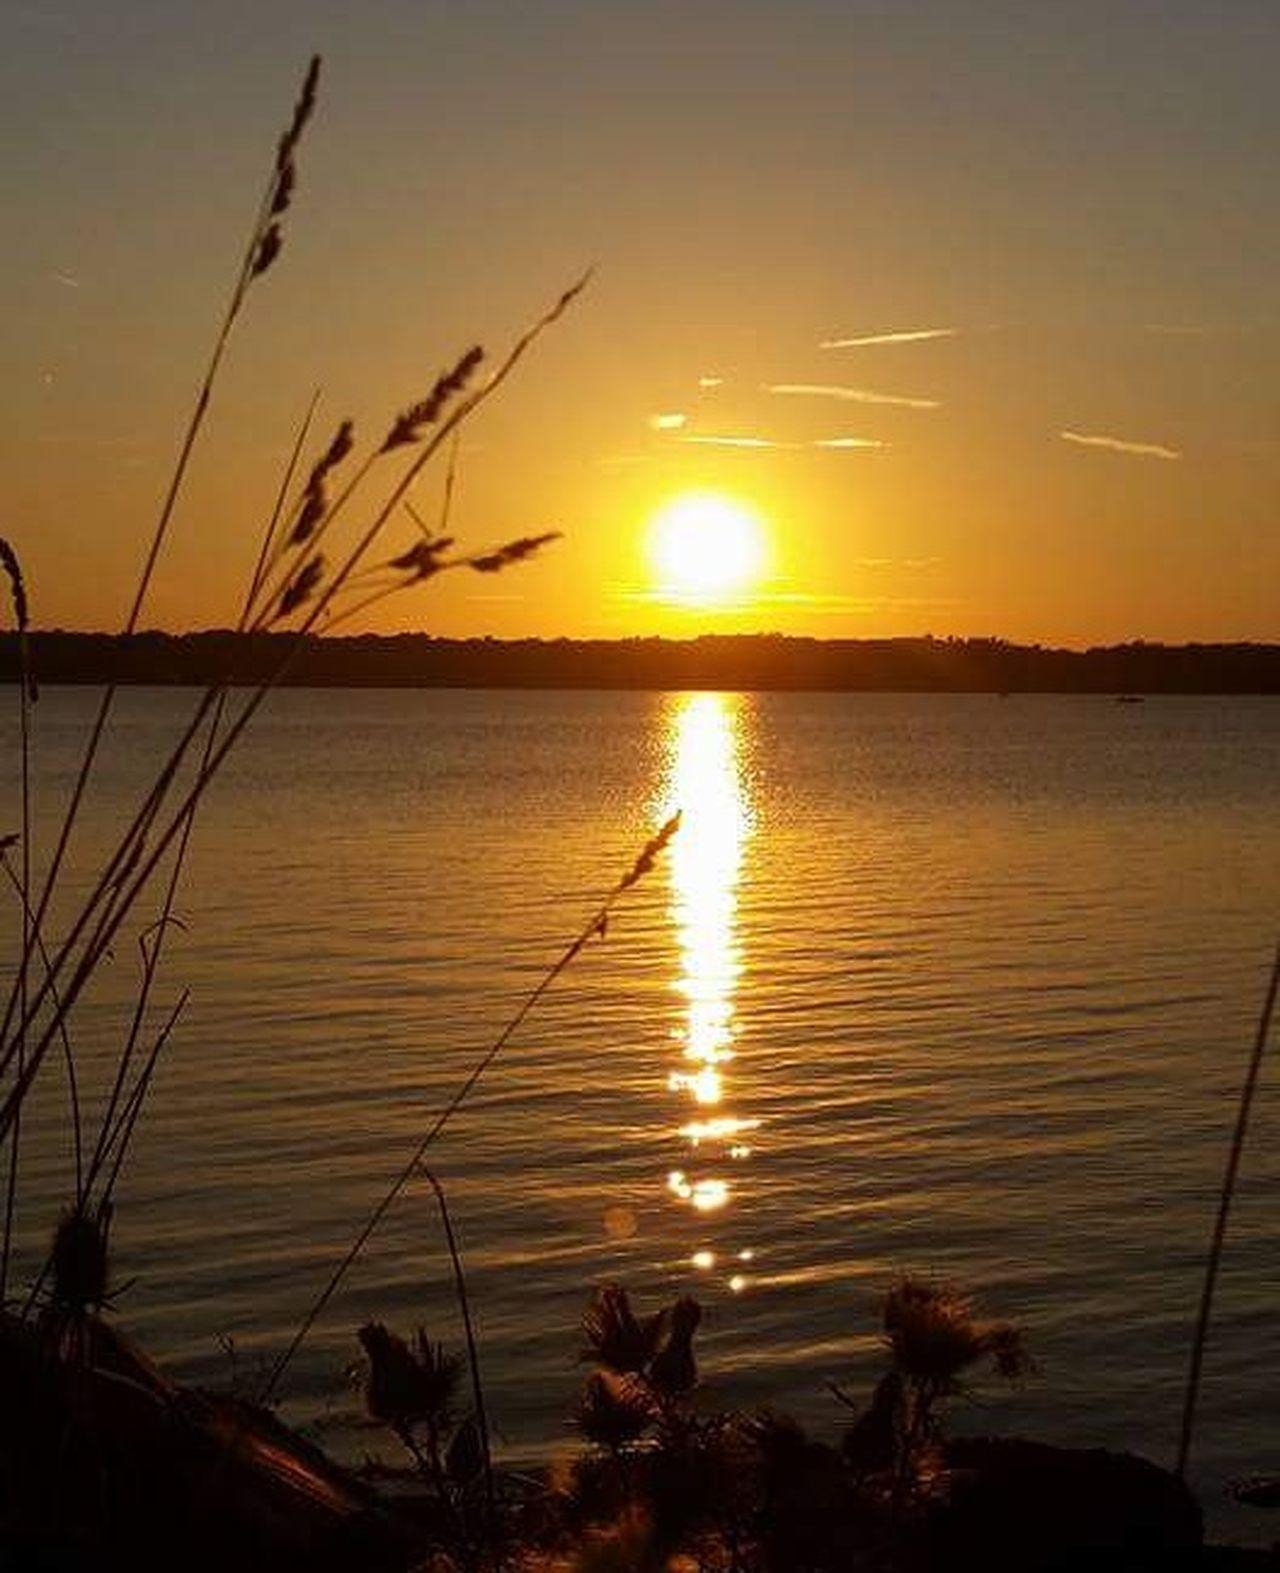 Sunset Water Landscape Nature Sky Outdoors No People Beach Lakeside Lake Mosquito Lake Ohio